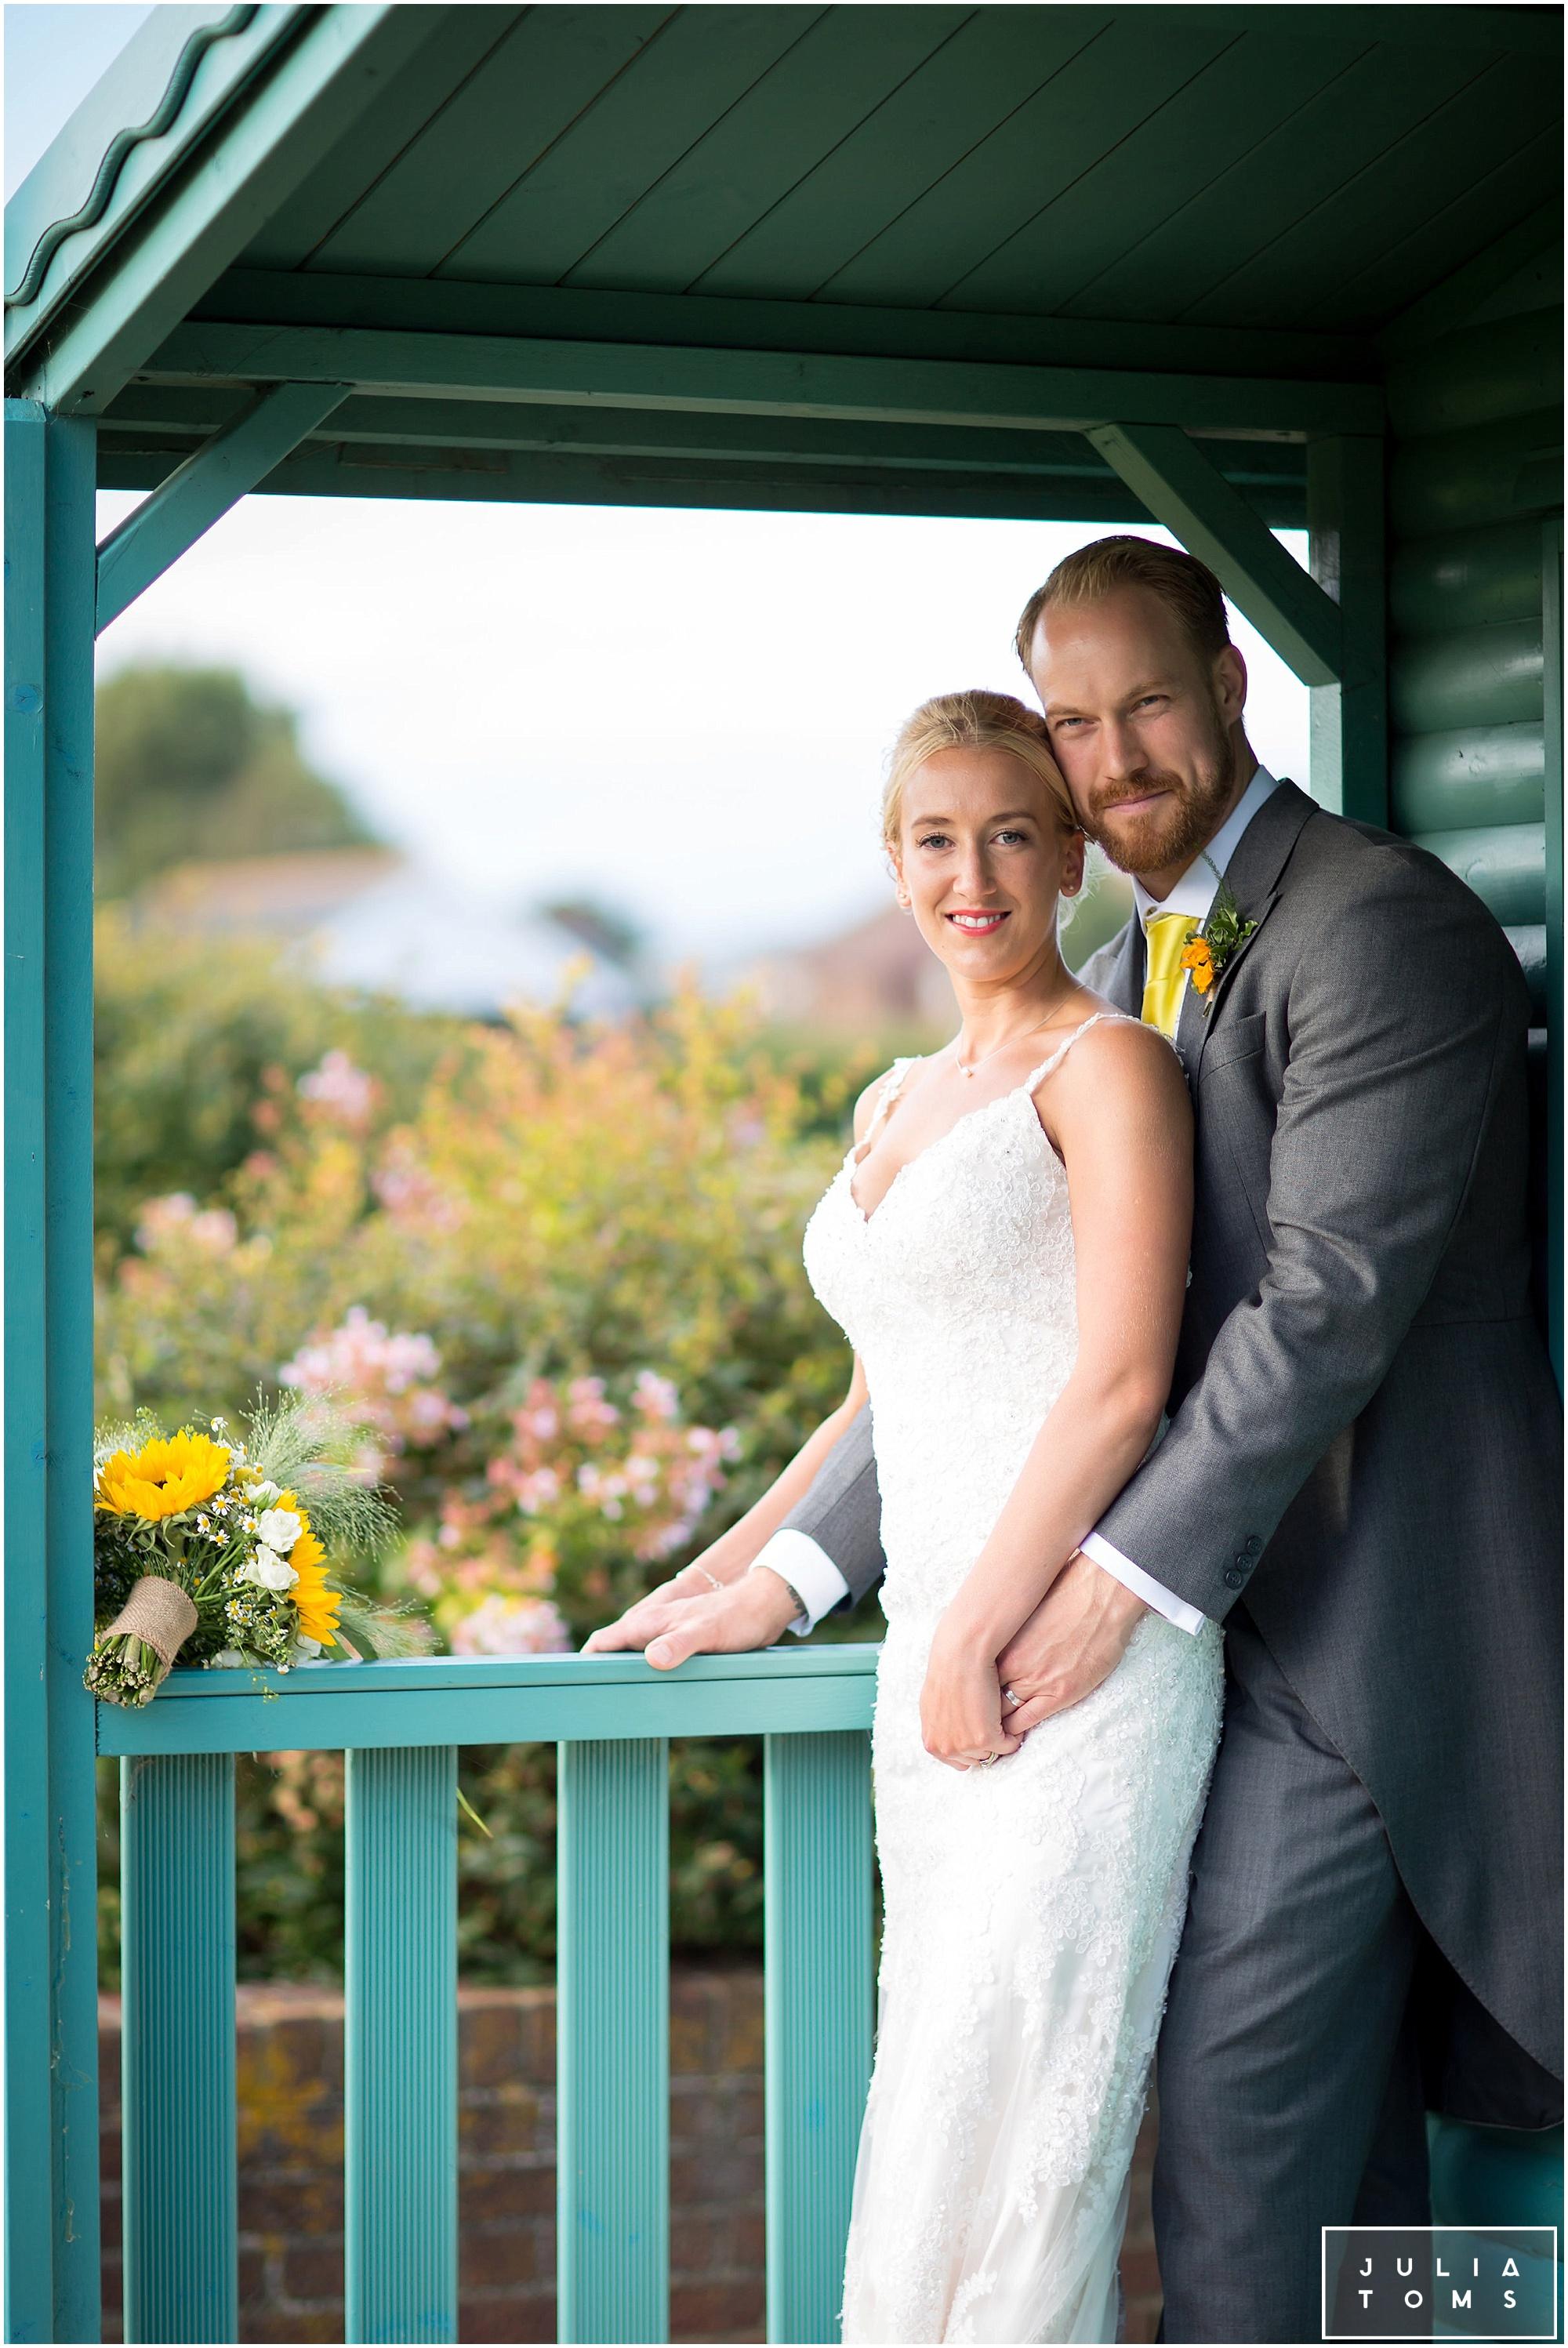 julia_toms_chichester_wedding_photographer_worthing_051.jpg